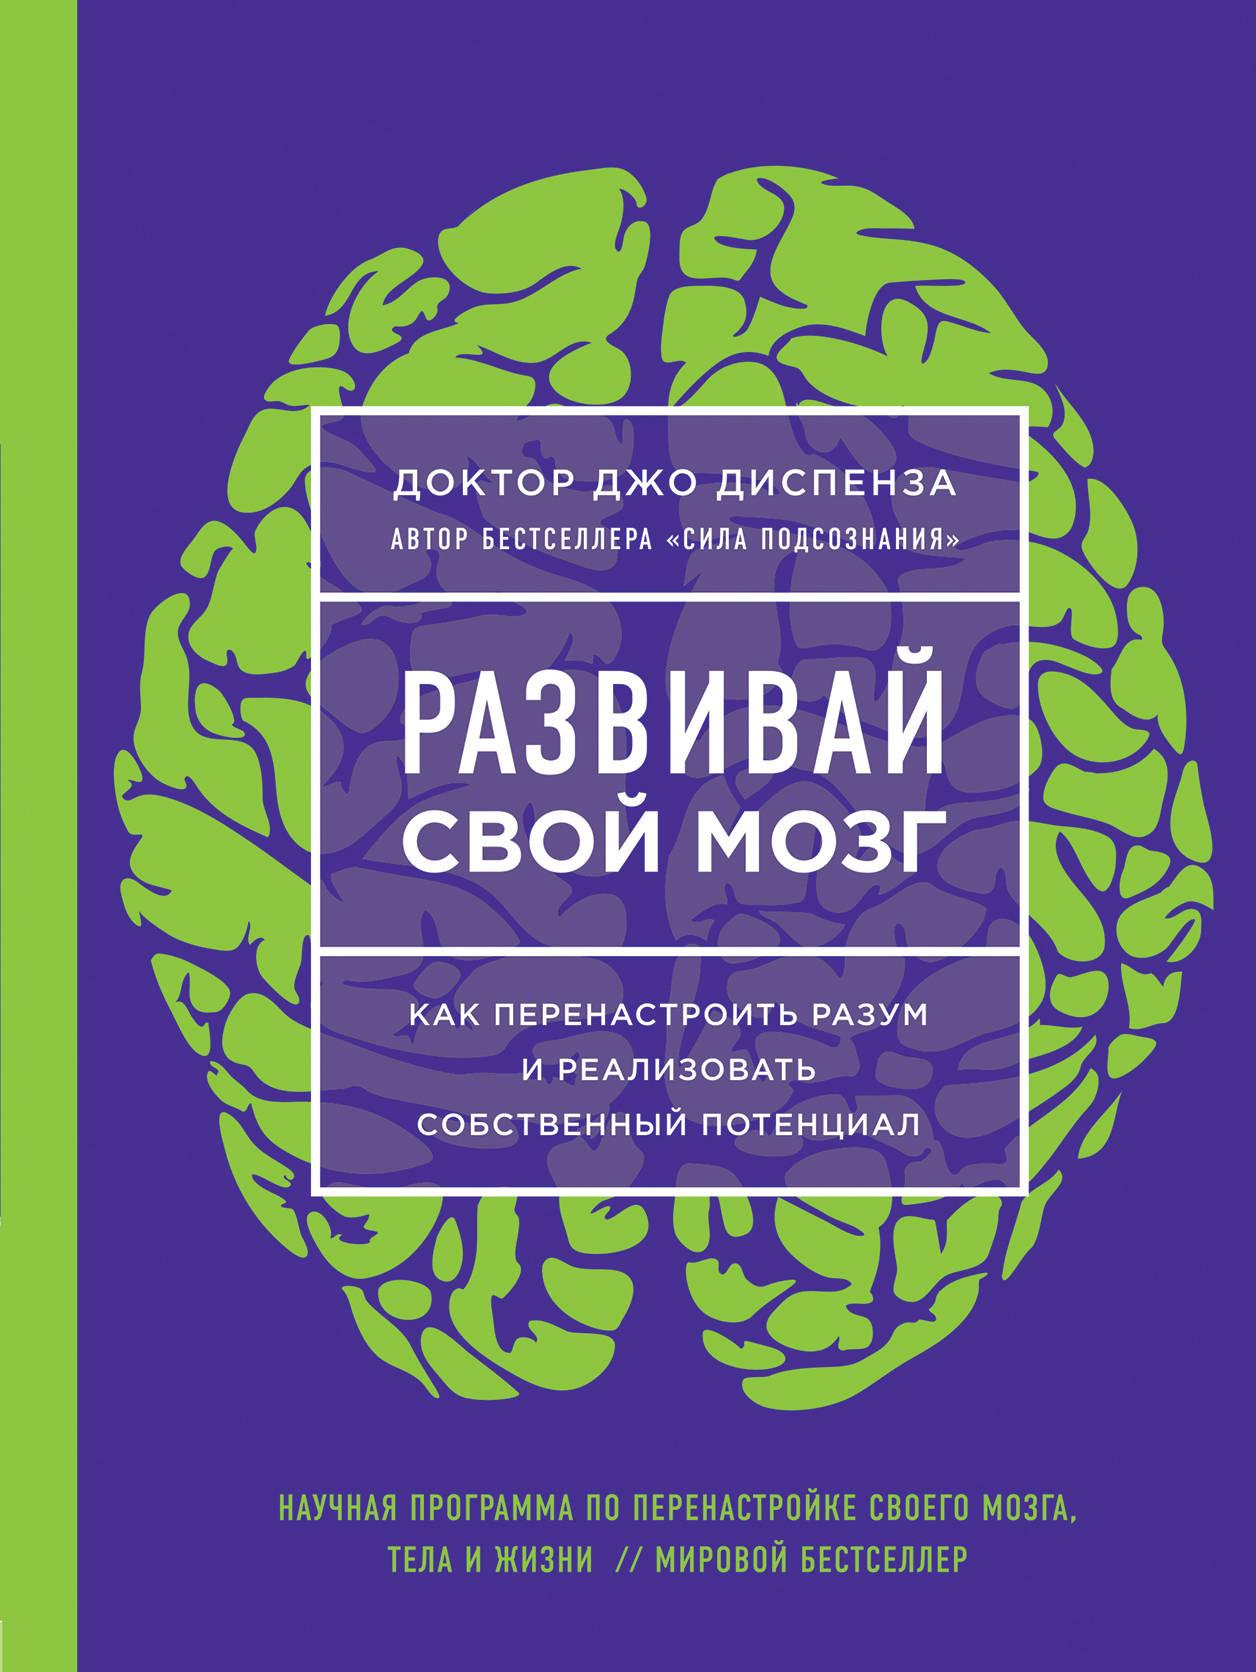 Razvivaj svoj mozg. Kak perenastroit razum i realizovat sobstvennyj potentsial